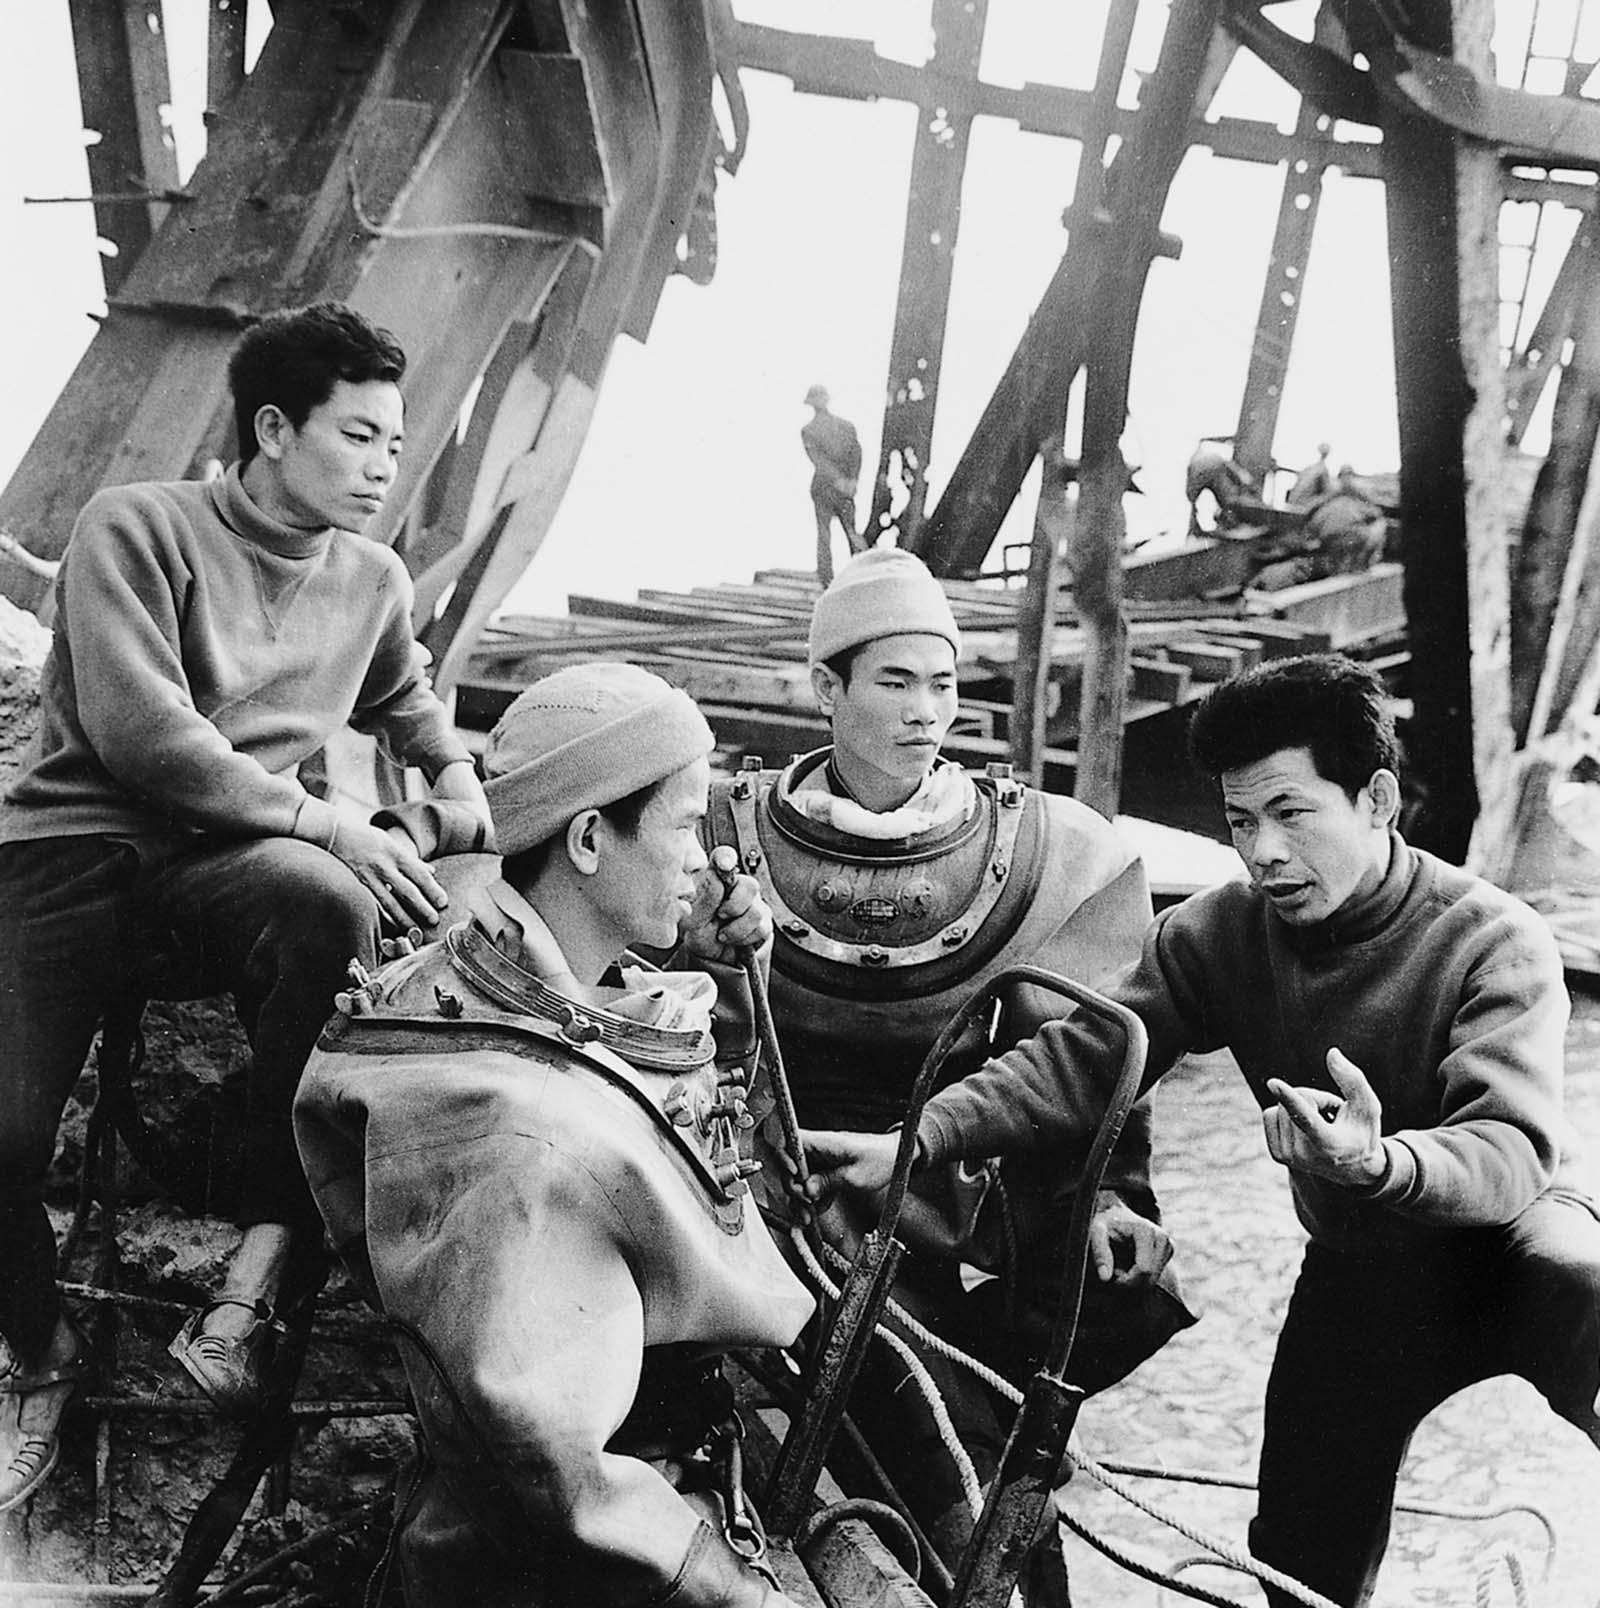 vietnam war images from vietnamese photographers